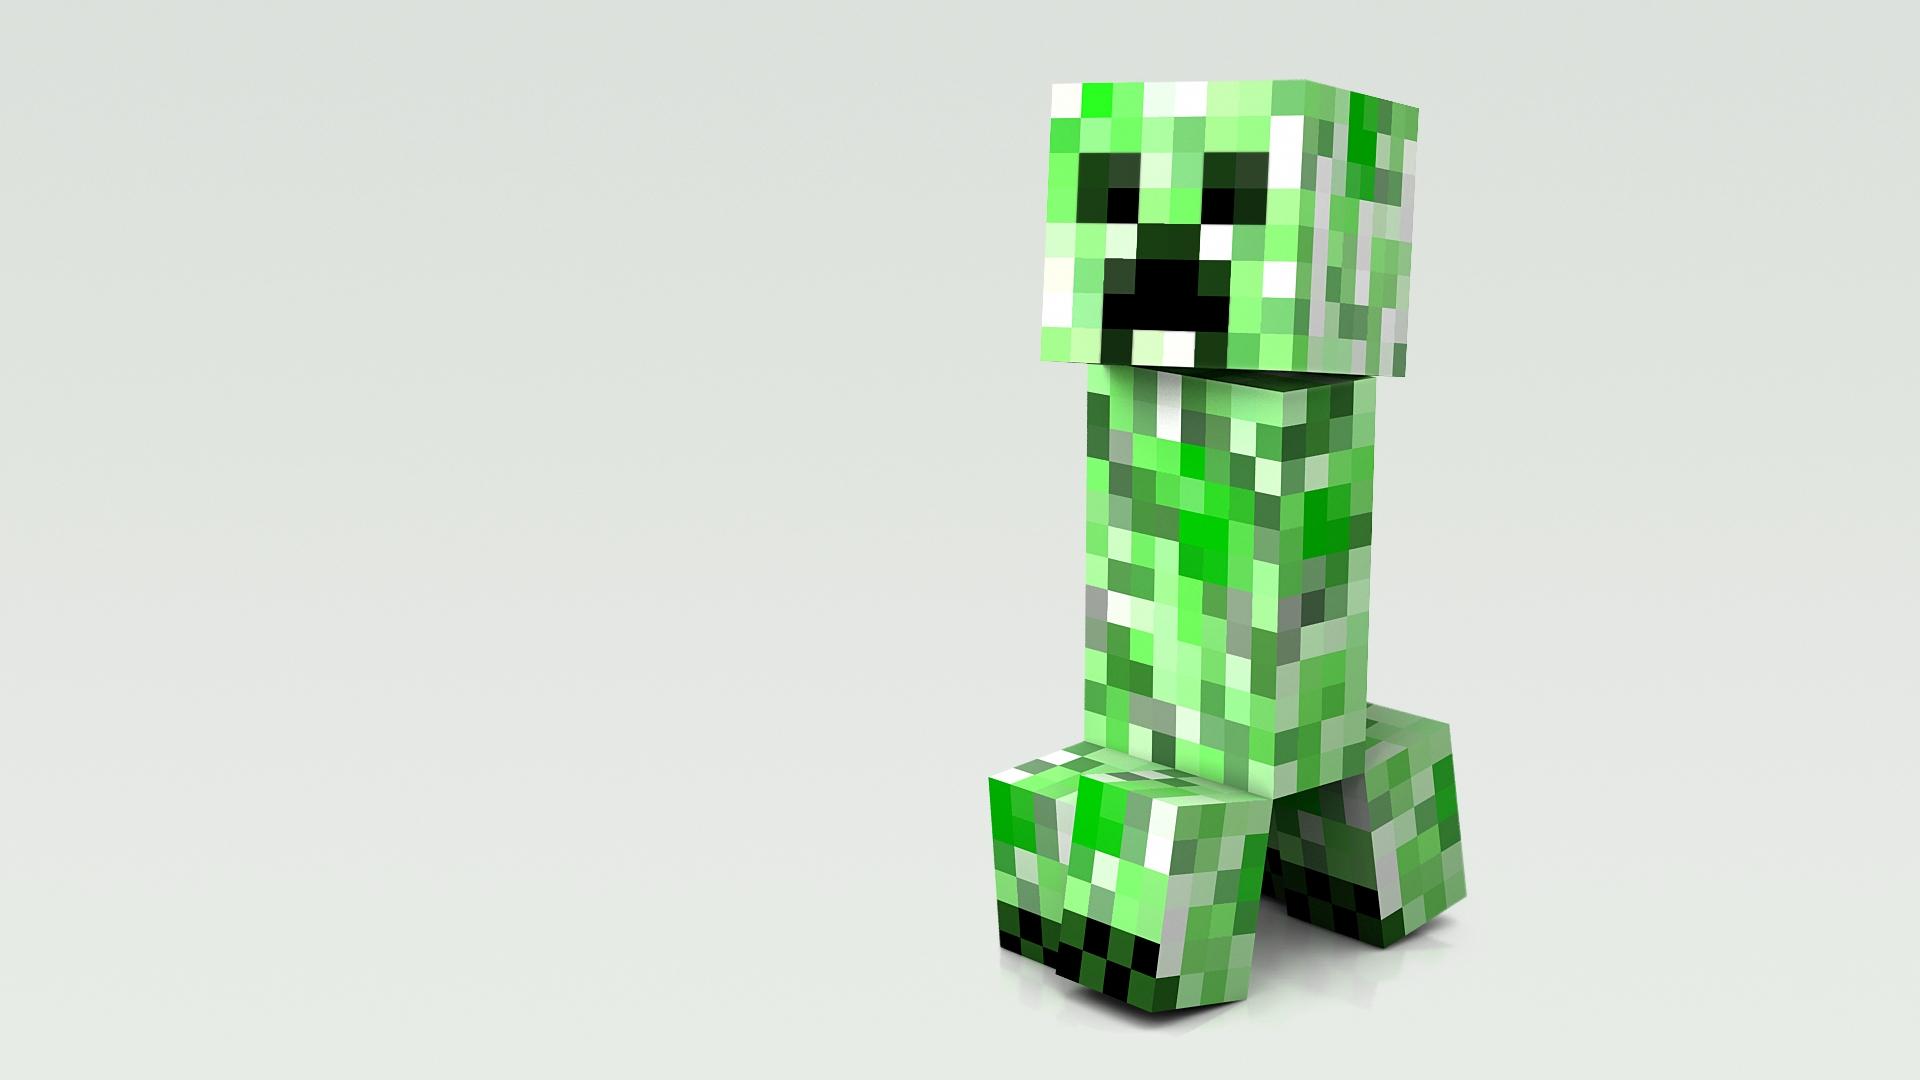 Minecraft Creeper Wallpaper Ipad, PC Minecraft Creeper Wallpaper ...